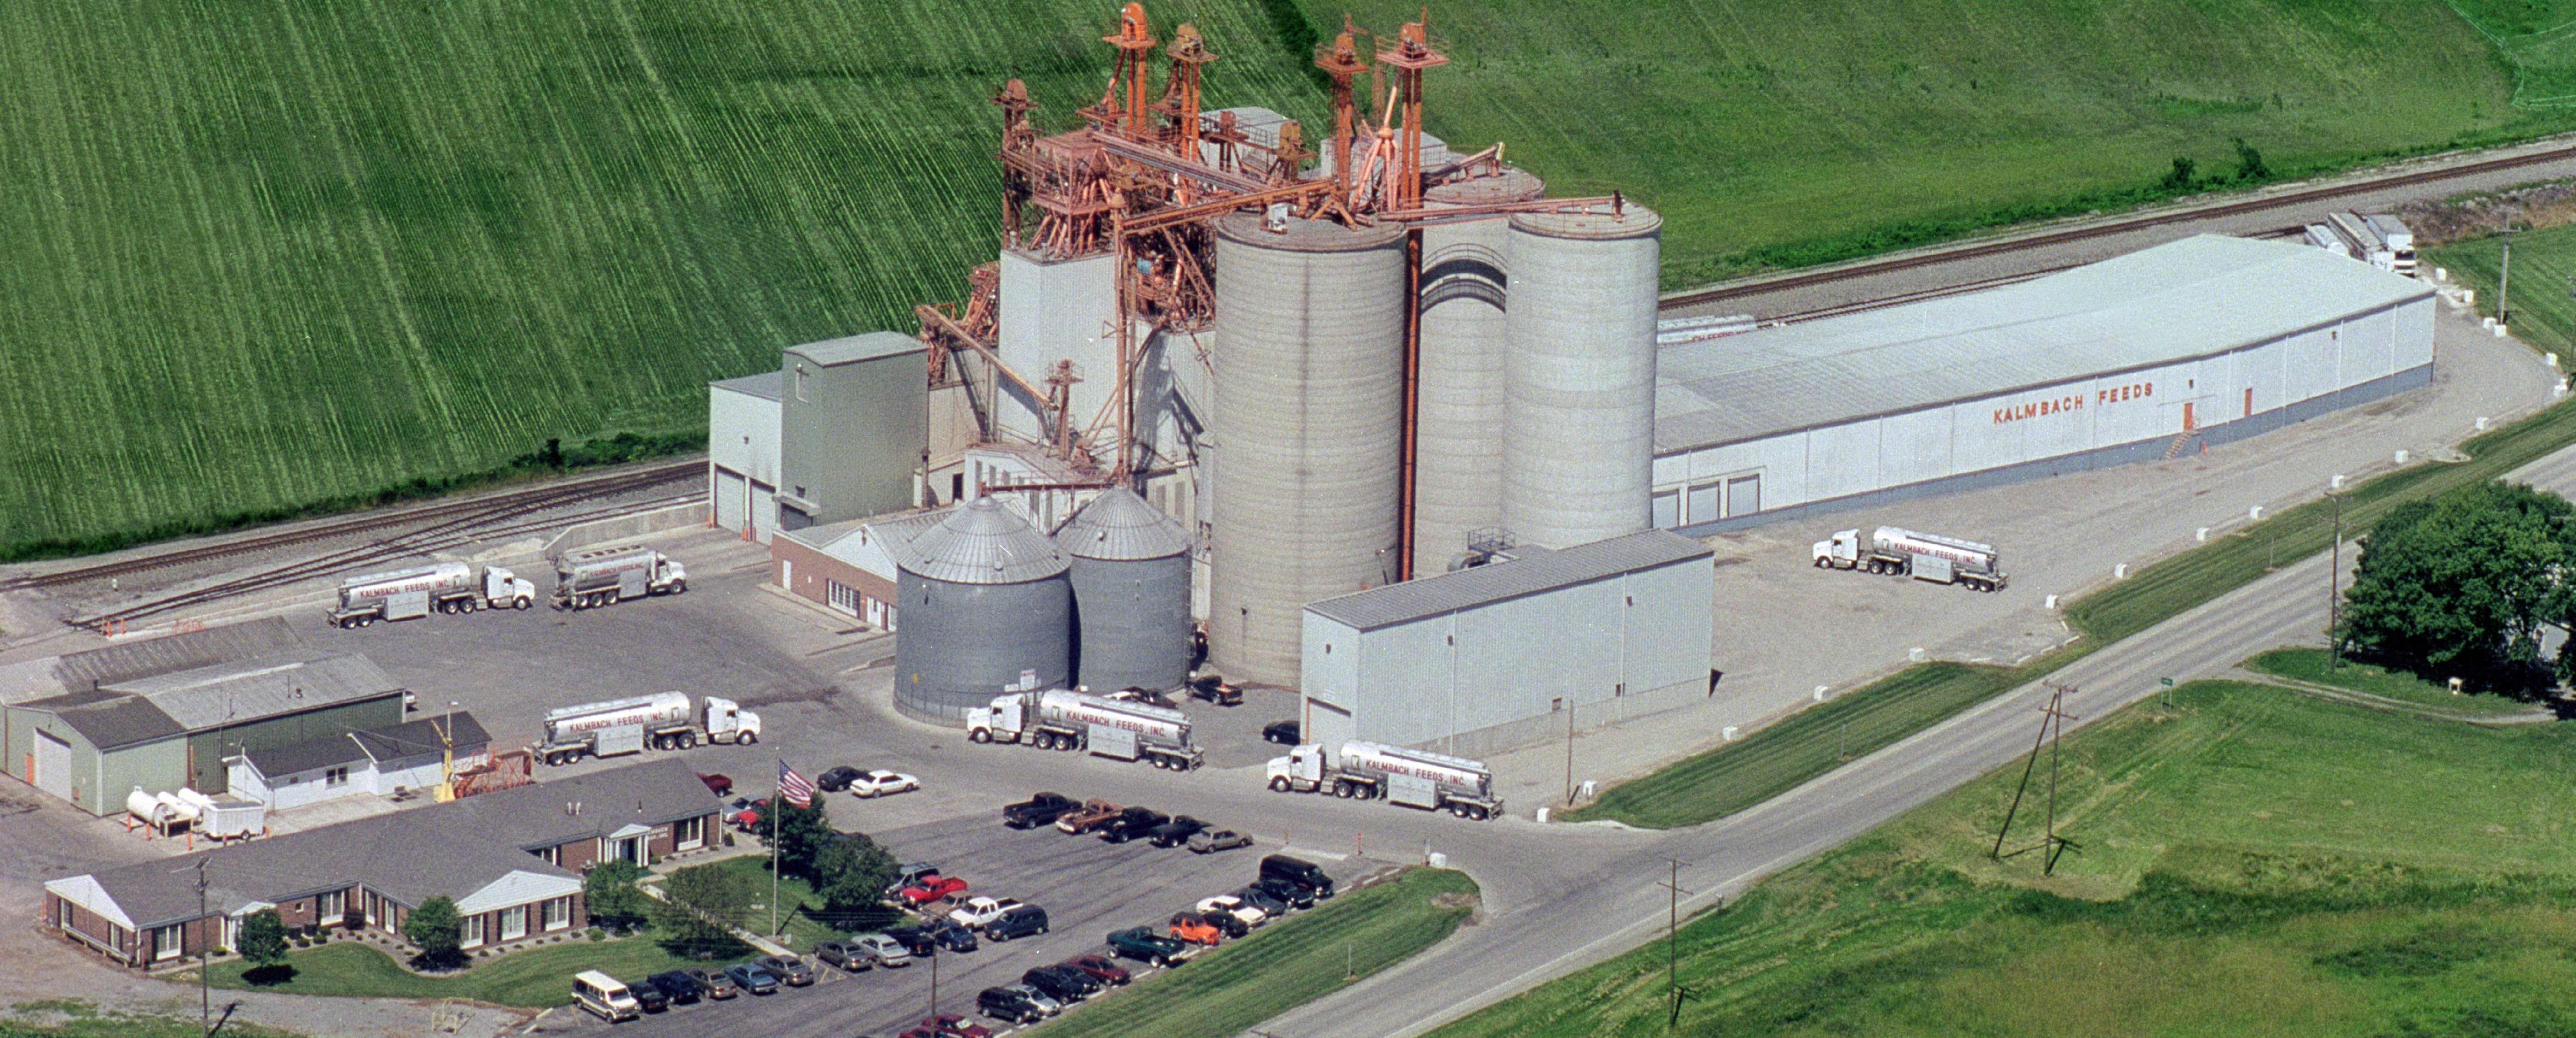 Kalmbach Feeds mill in Upper Sandusky, Ohio